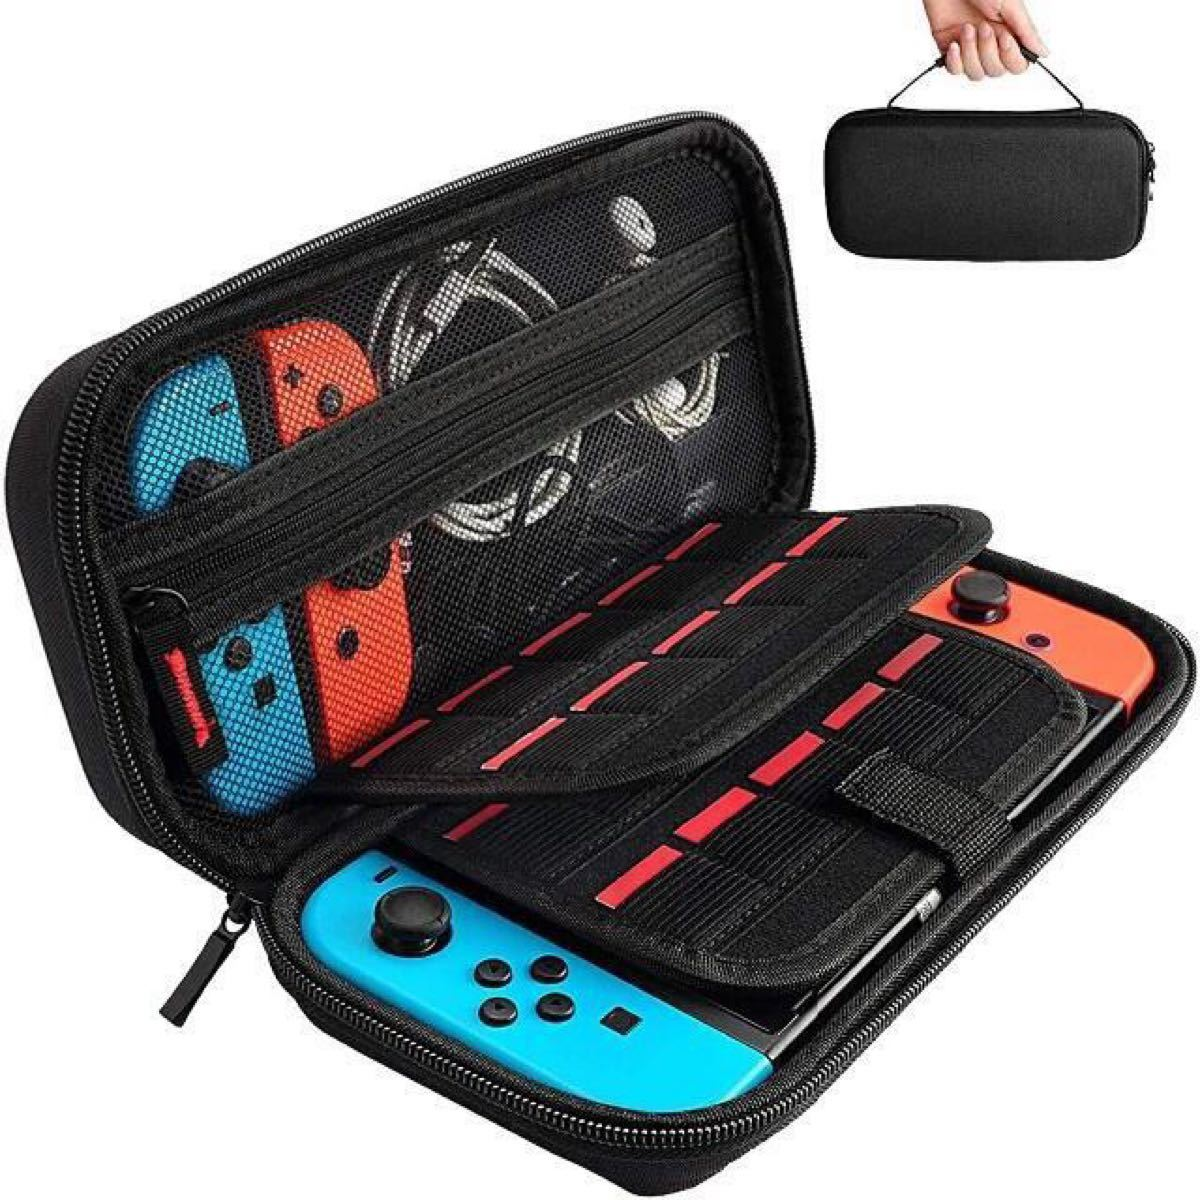 Nintendo Switch 任天堂スイッチ 収納バッグ